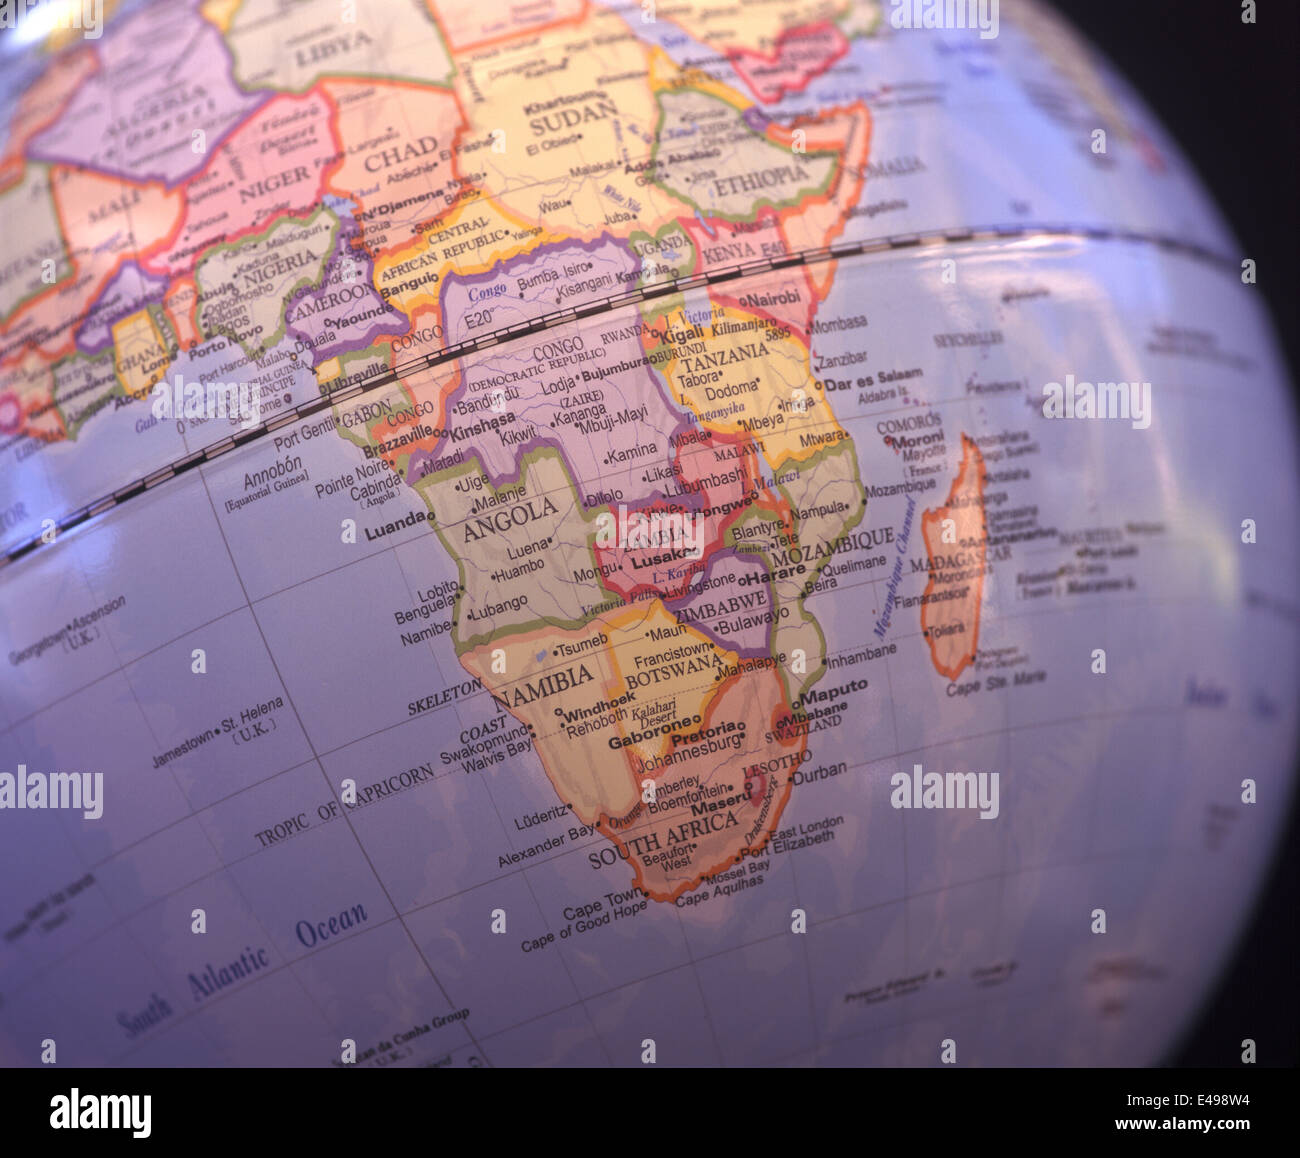 Congo Globe Stock Photos & Congo Globe Stock Images - Alamy